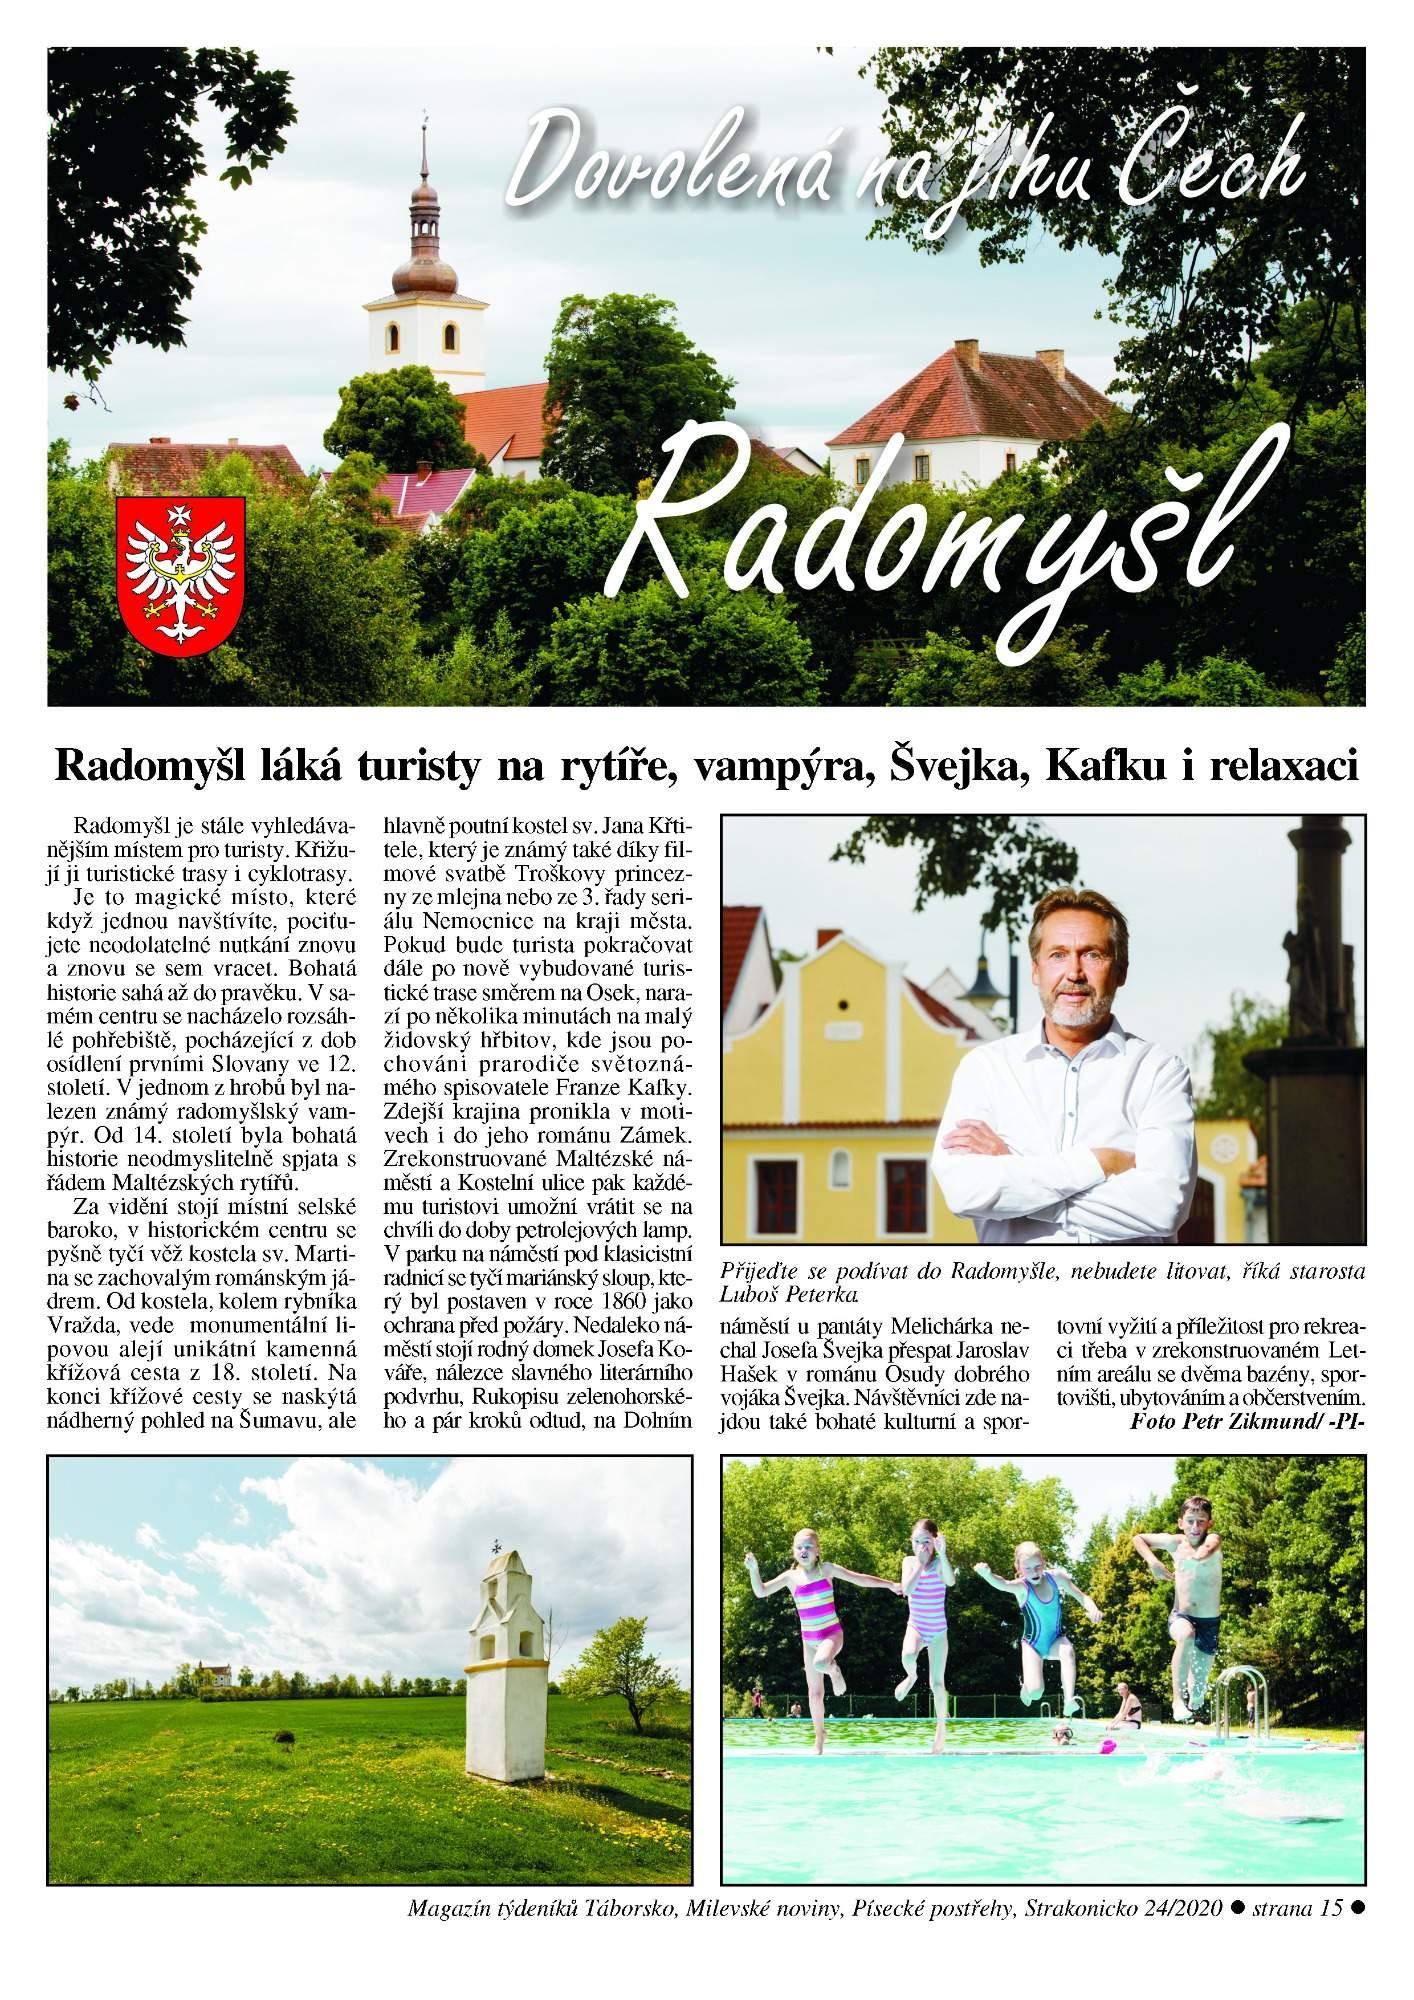 o Radomysli